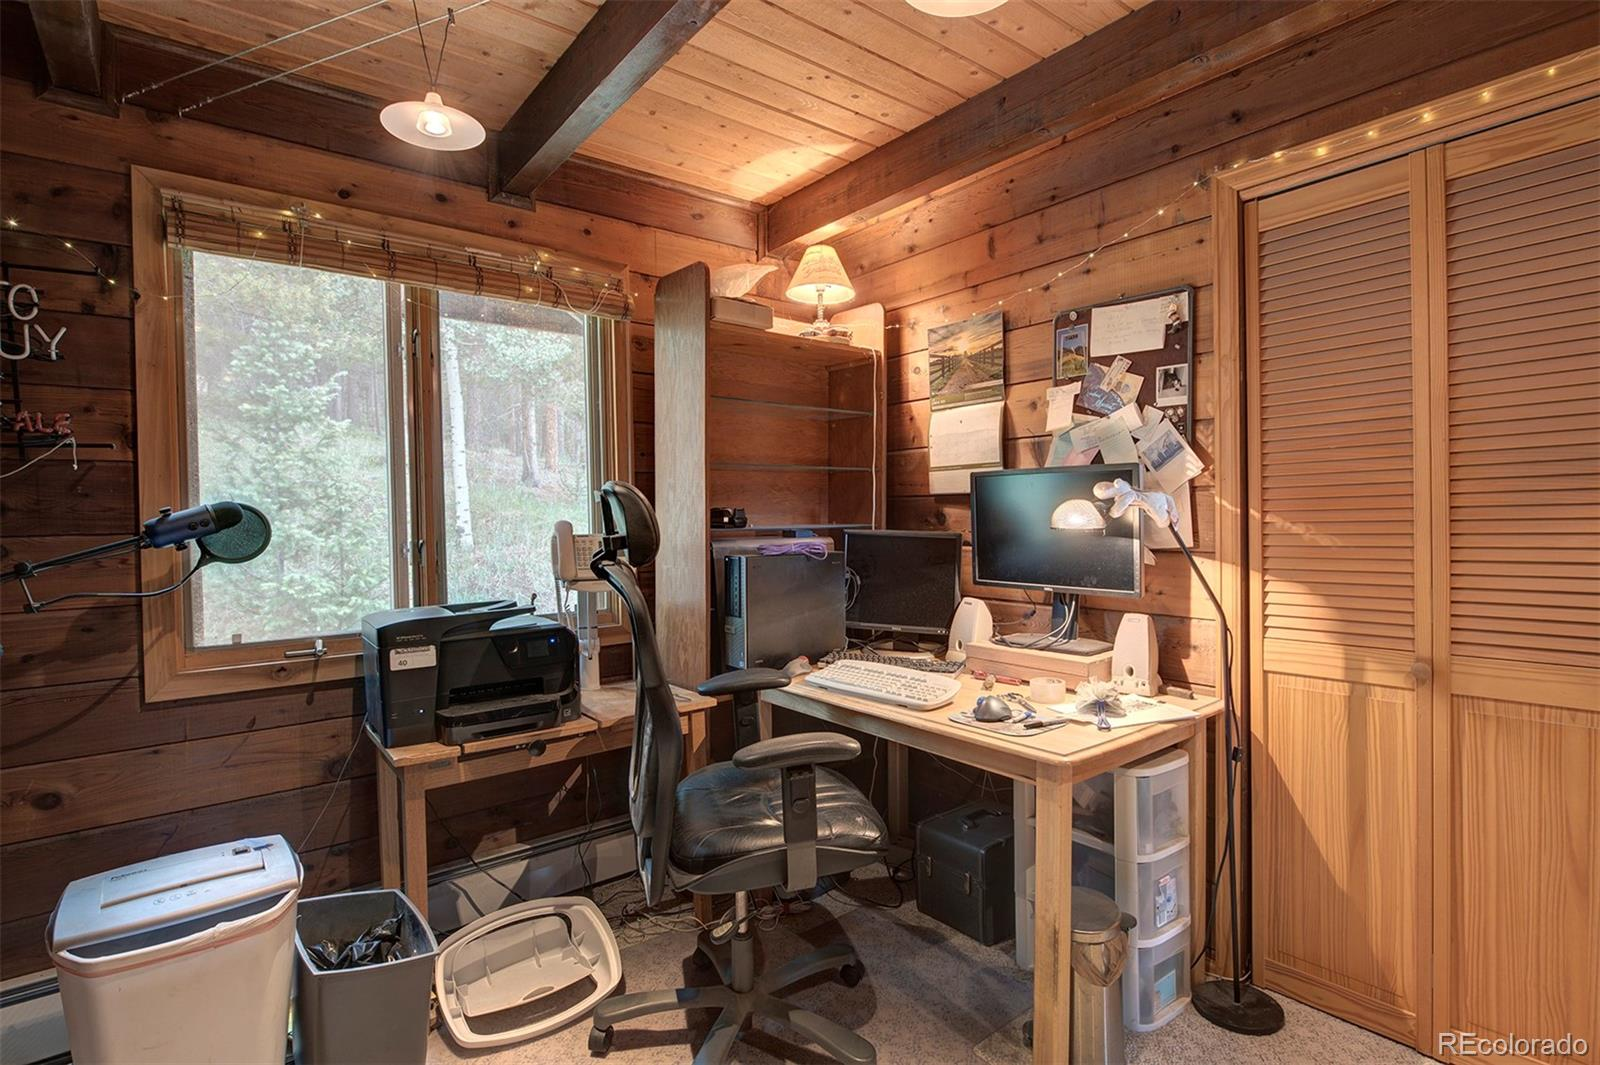 MLS# 6922377 - 15 - 12123 Geronimo Trail, Conifer, CO 80433